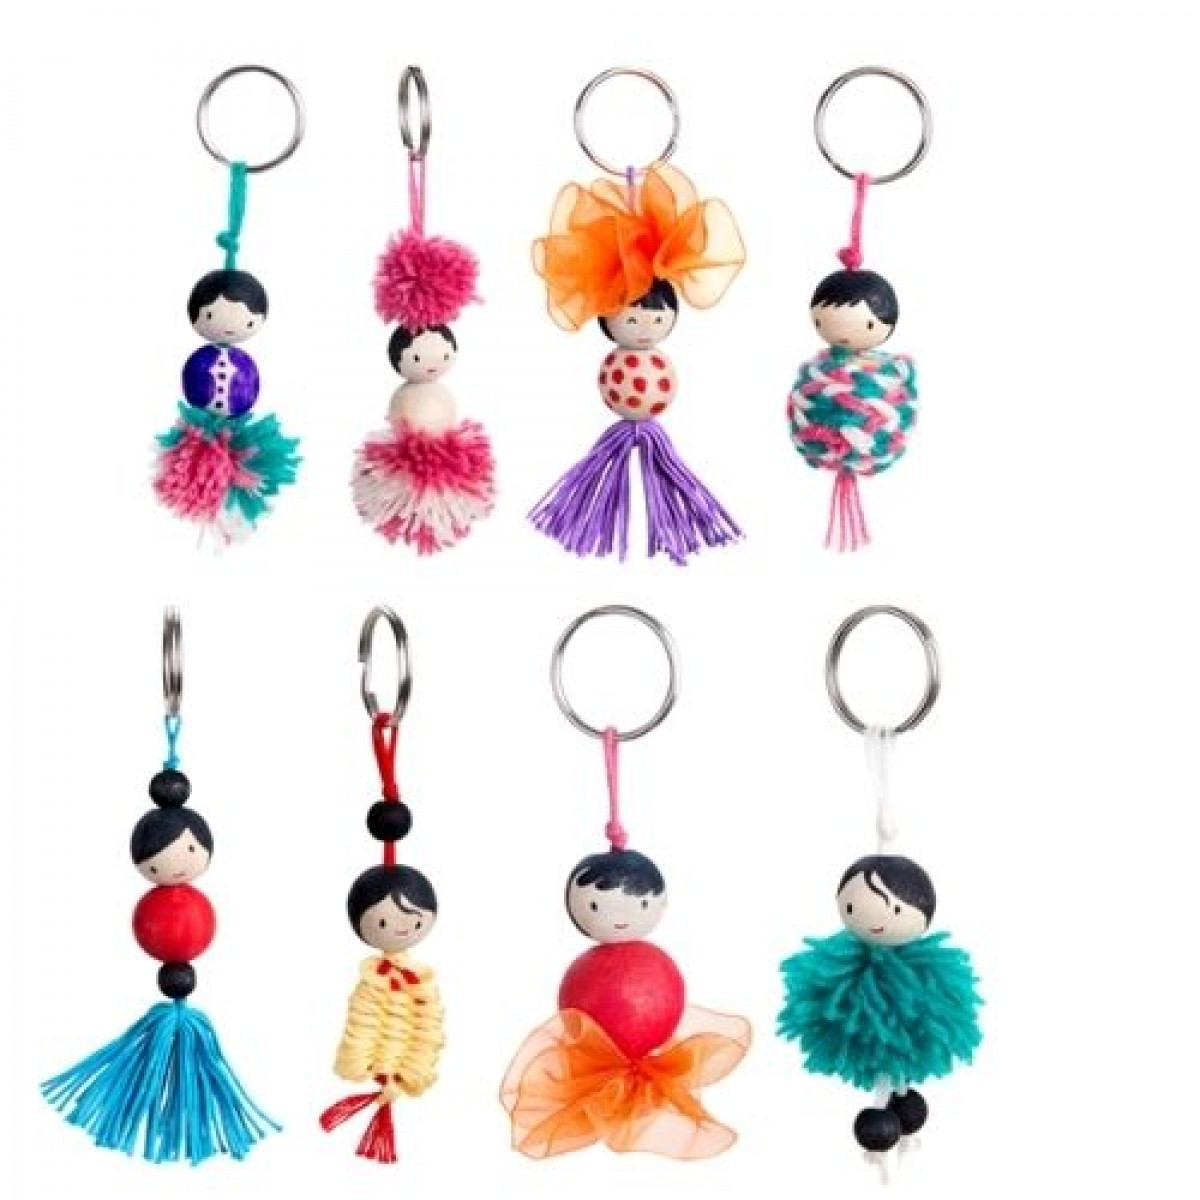 Keychain Dolls - Activity Box